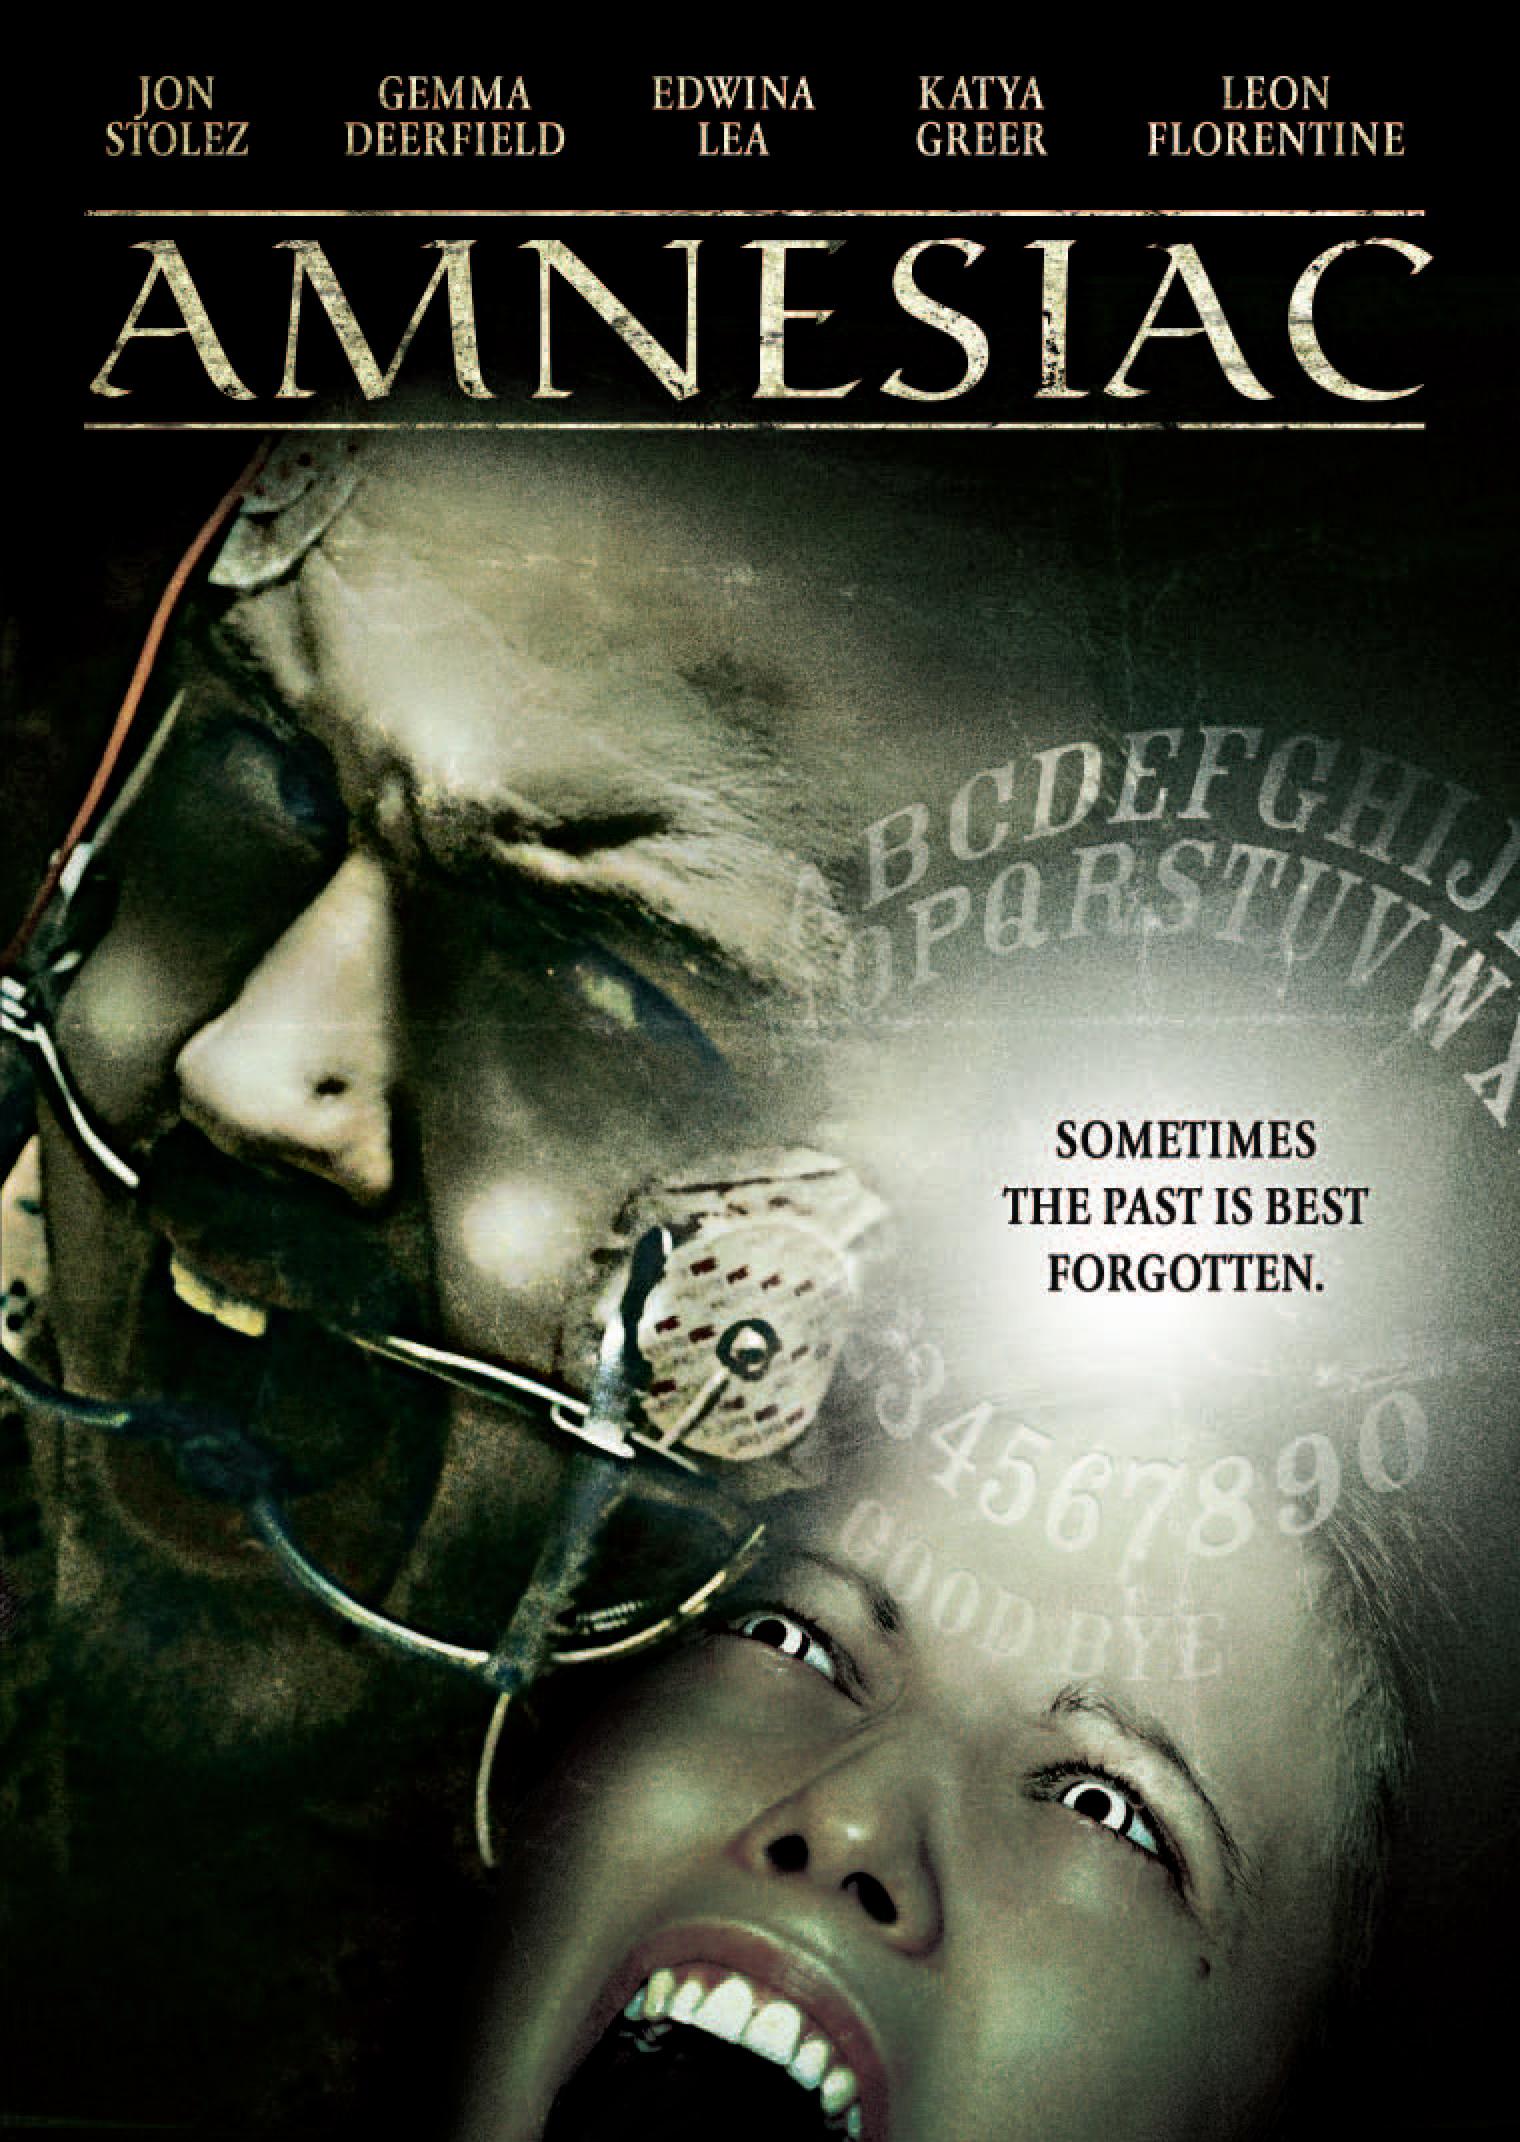 Amnesiac Film